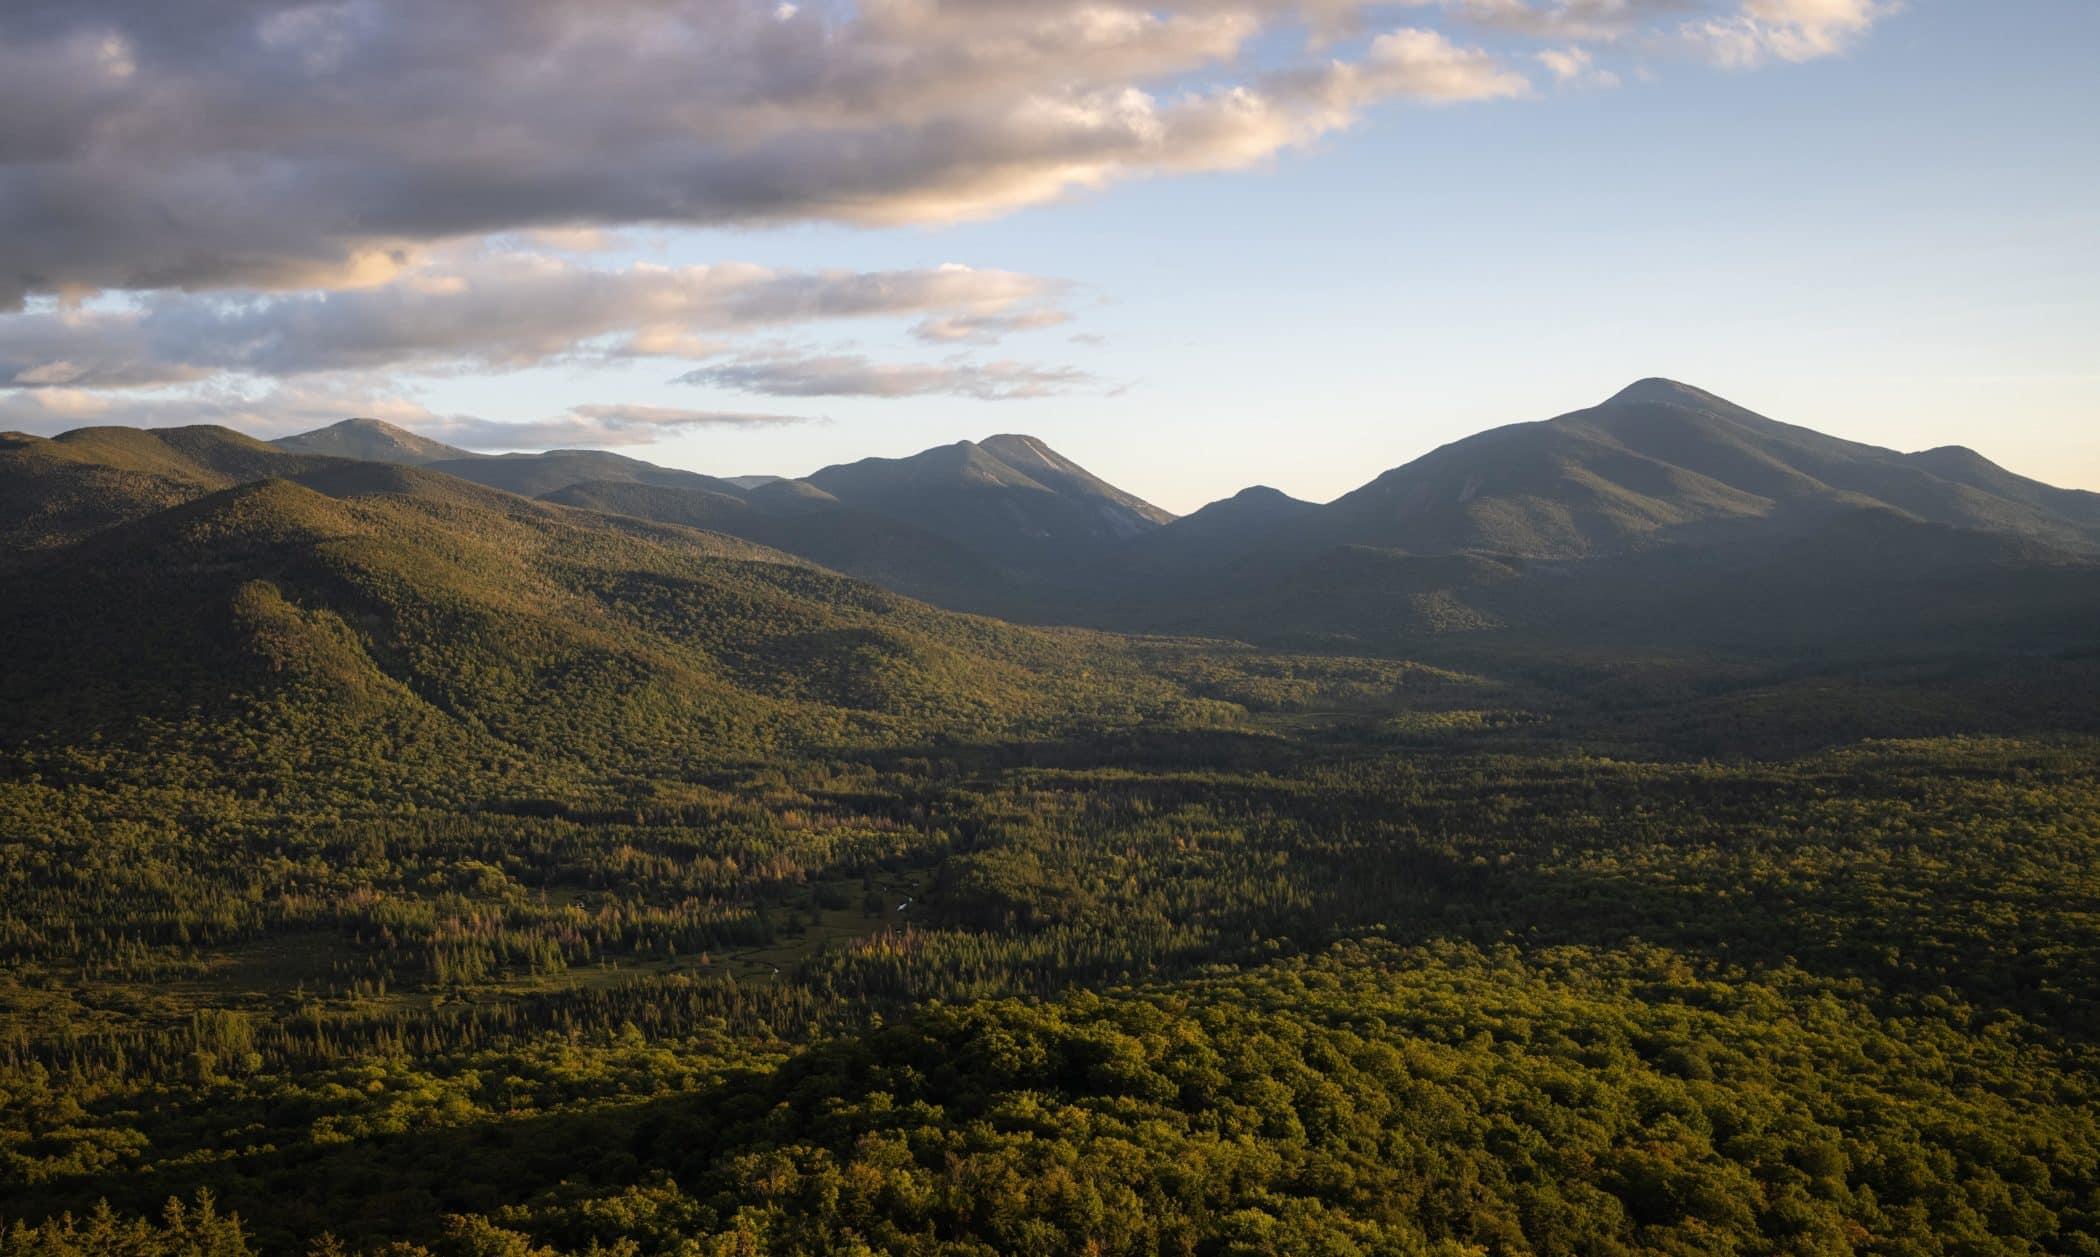 View from the summit of Mount Van Hoevenberg in Lake Placid, Adirondacks New York